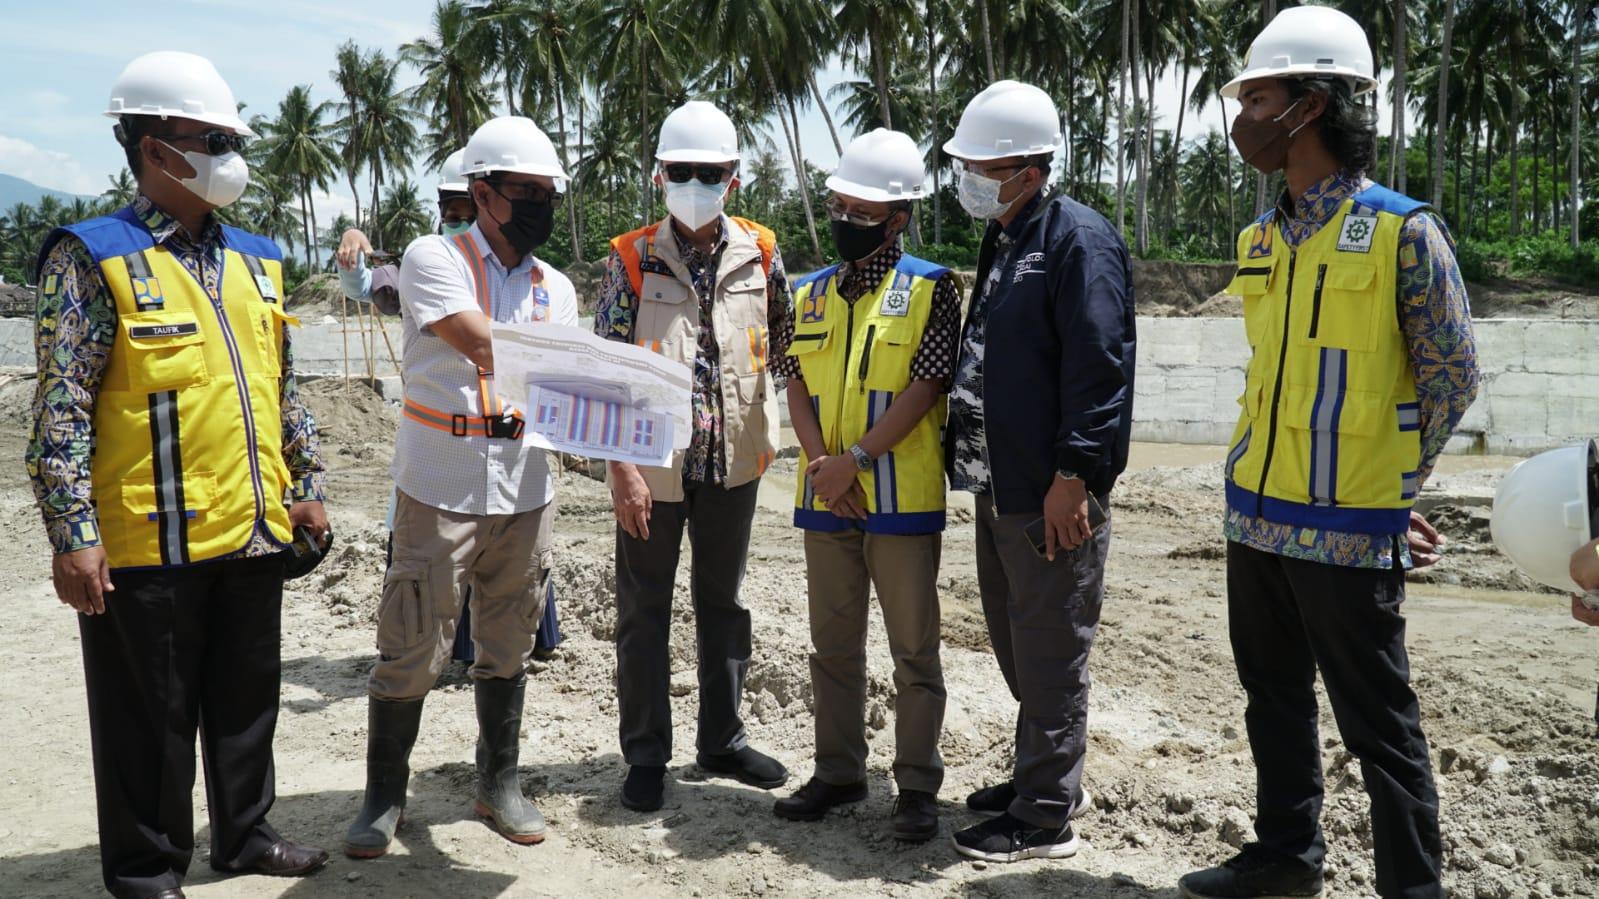 kunjungan-kasatgas-bencana-pupr-sulawesi-tengah-pada-pekerjaan-river-improvement-and-sediment-control-di-kabupaten-sigi